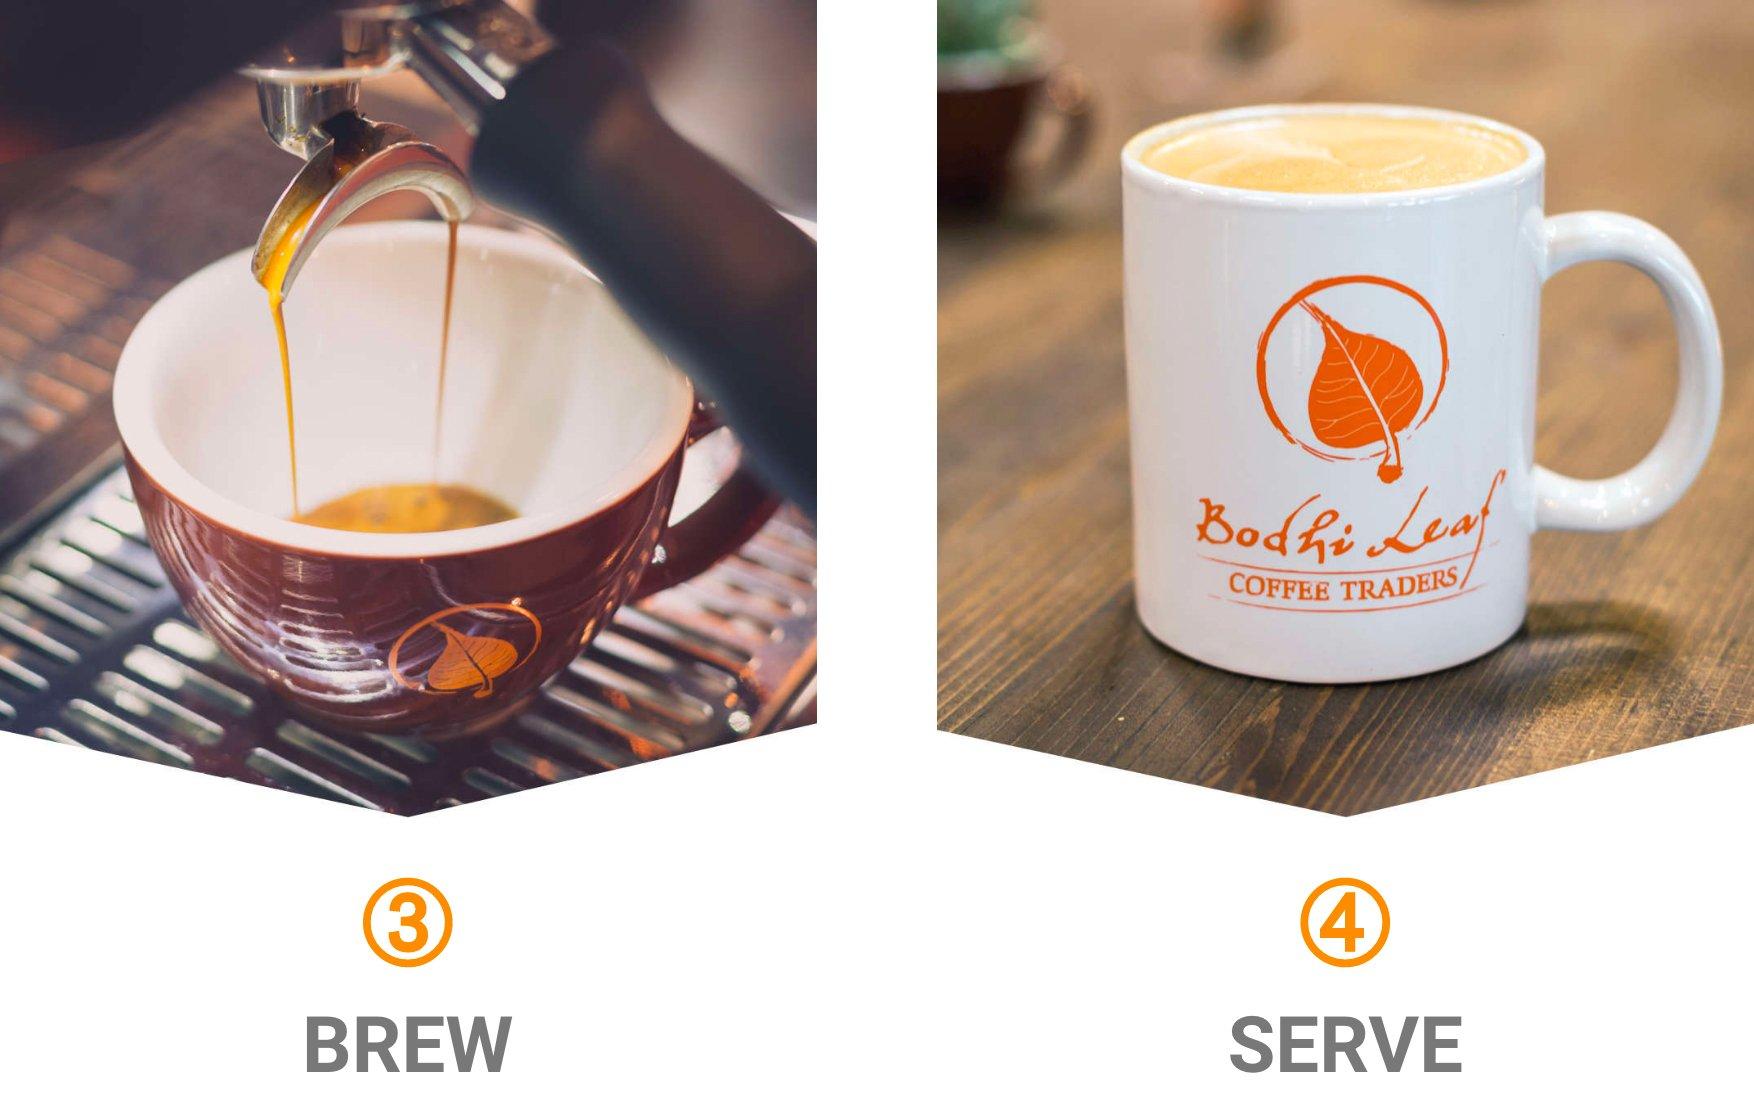 3-BREW 4-SERVE - ESPRESSO SHOT AND MUG OF COFFEE